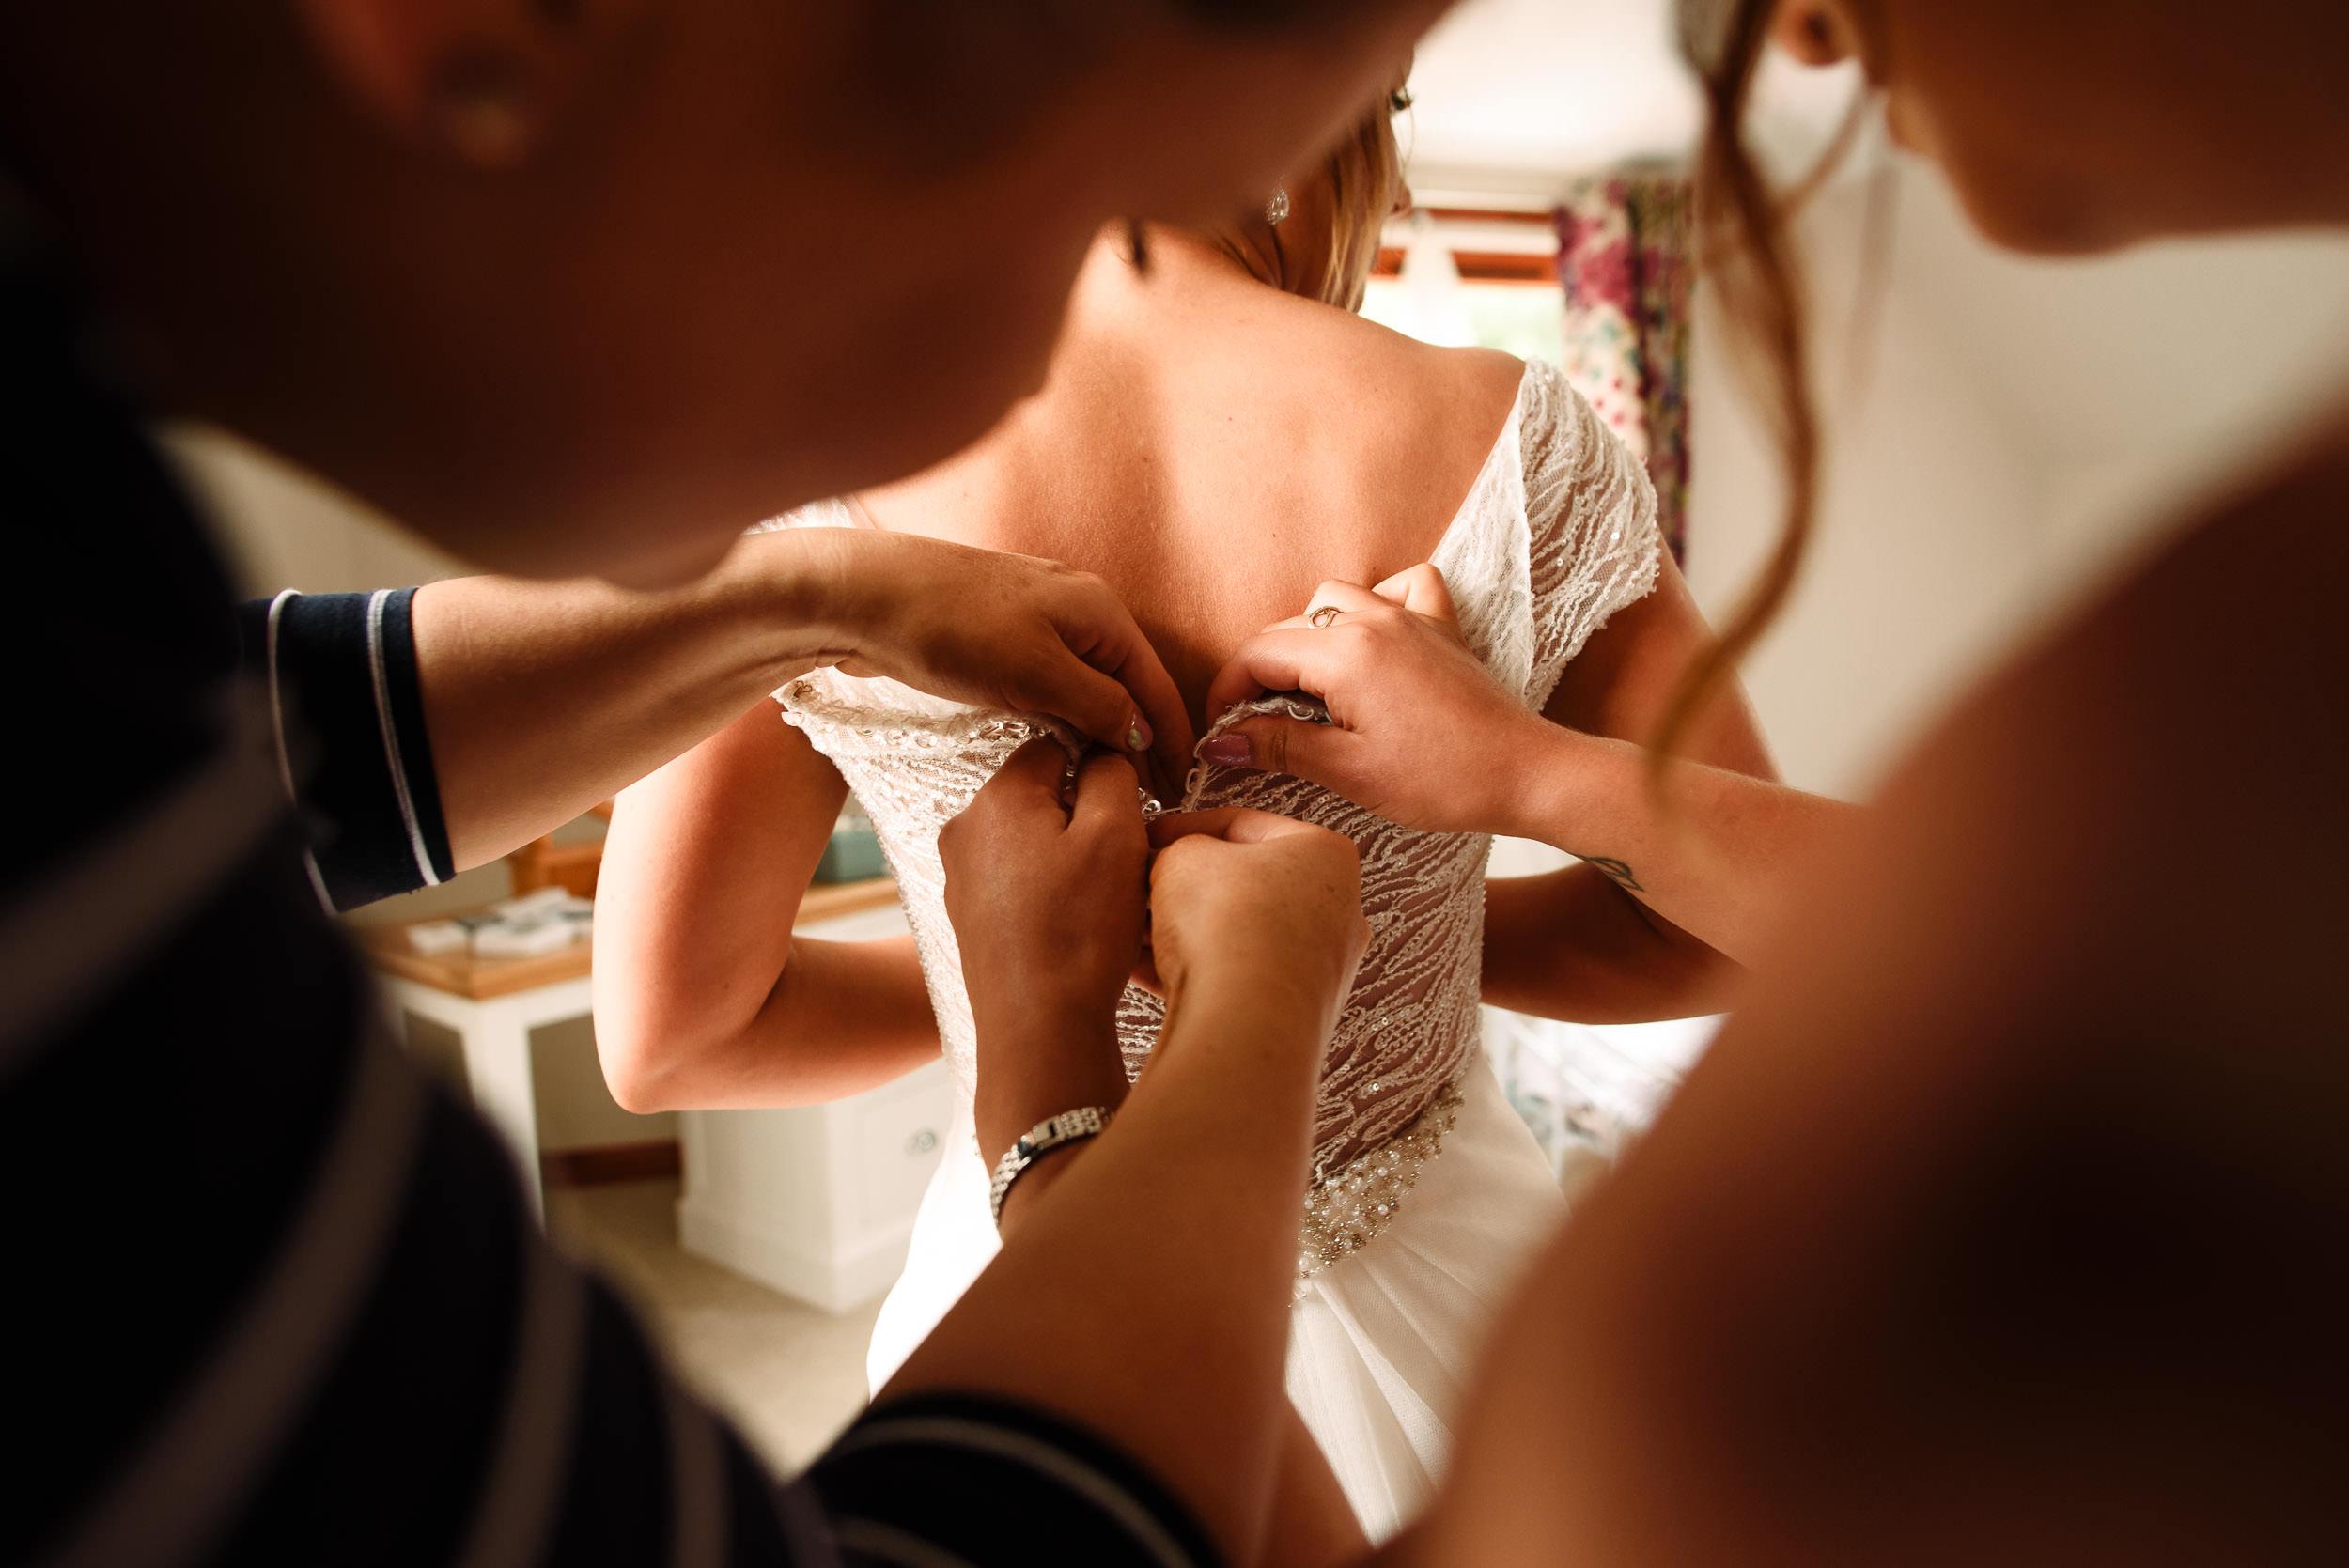 bridesmaids doing up a brides dress